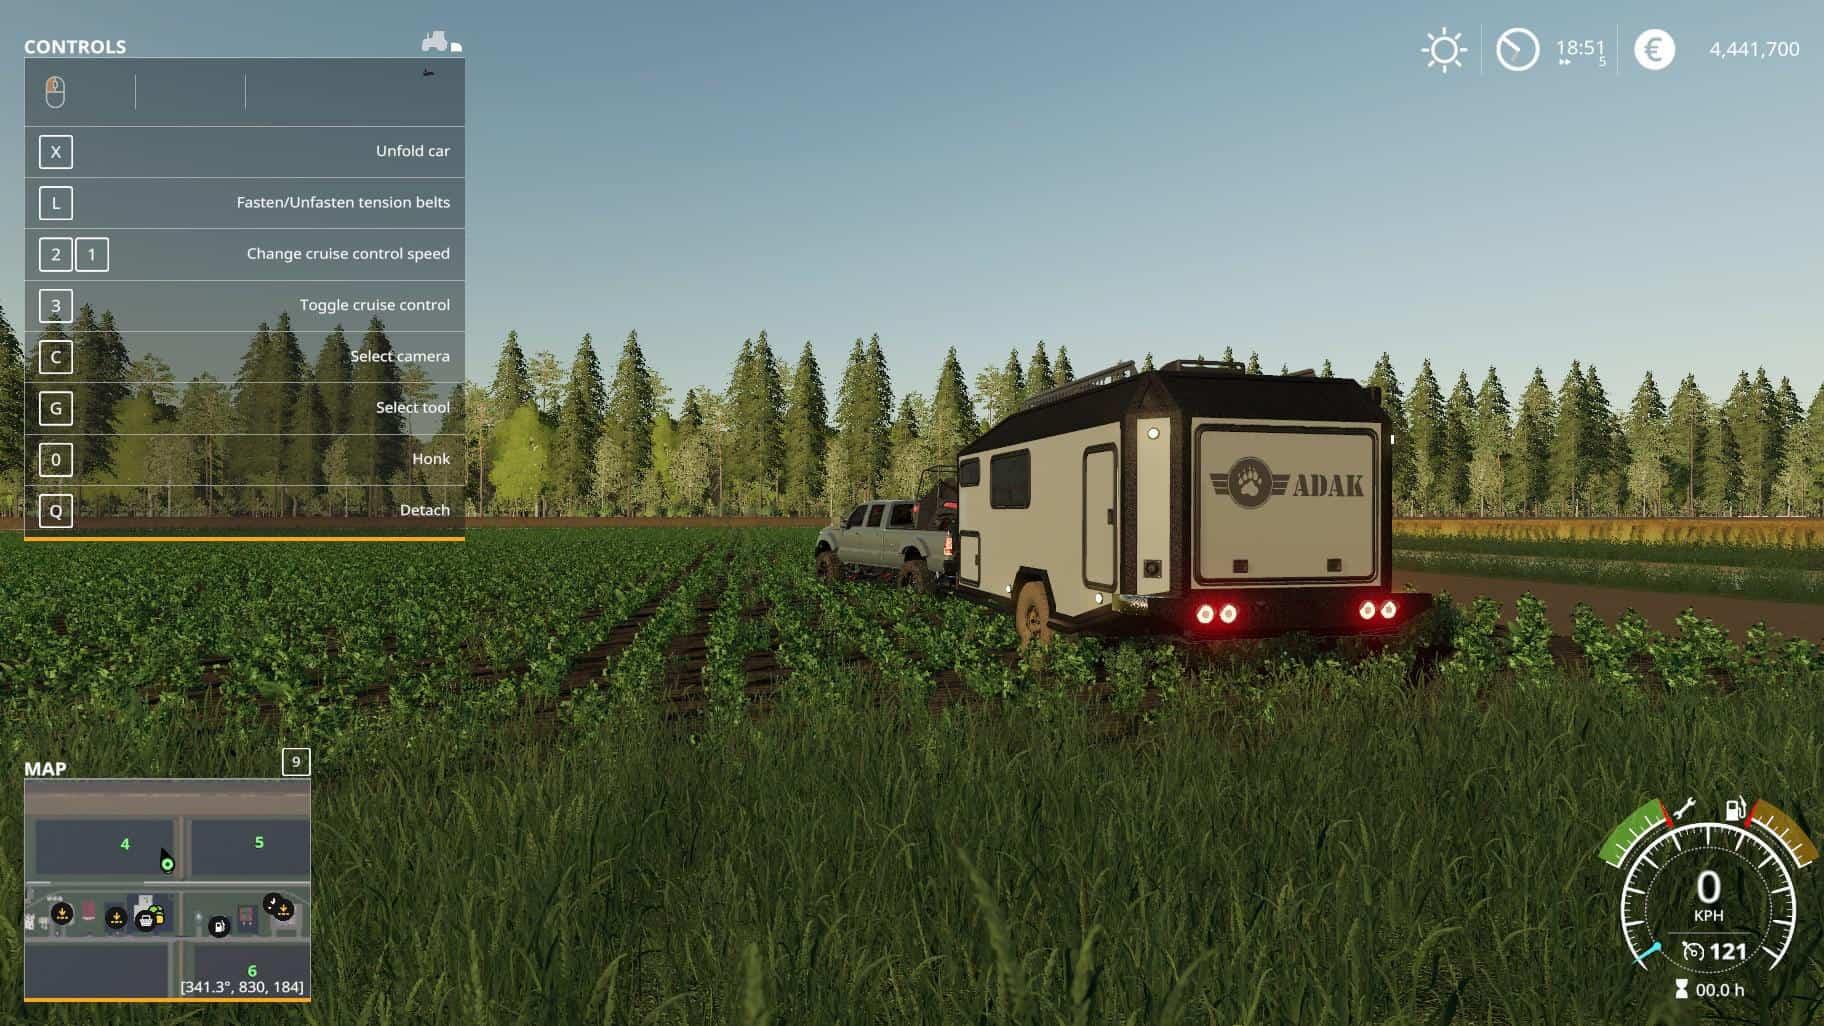 ADAK OFF ROAD CAMPER V1 0 Mod - Farming Simulator 19 Mod / FS19